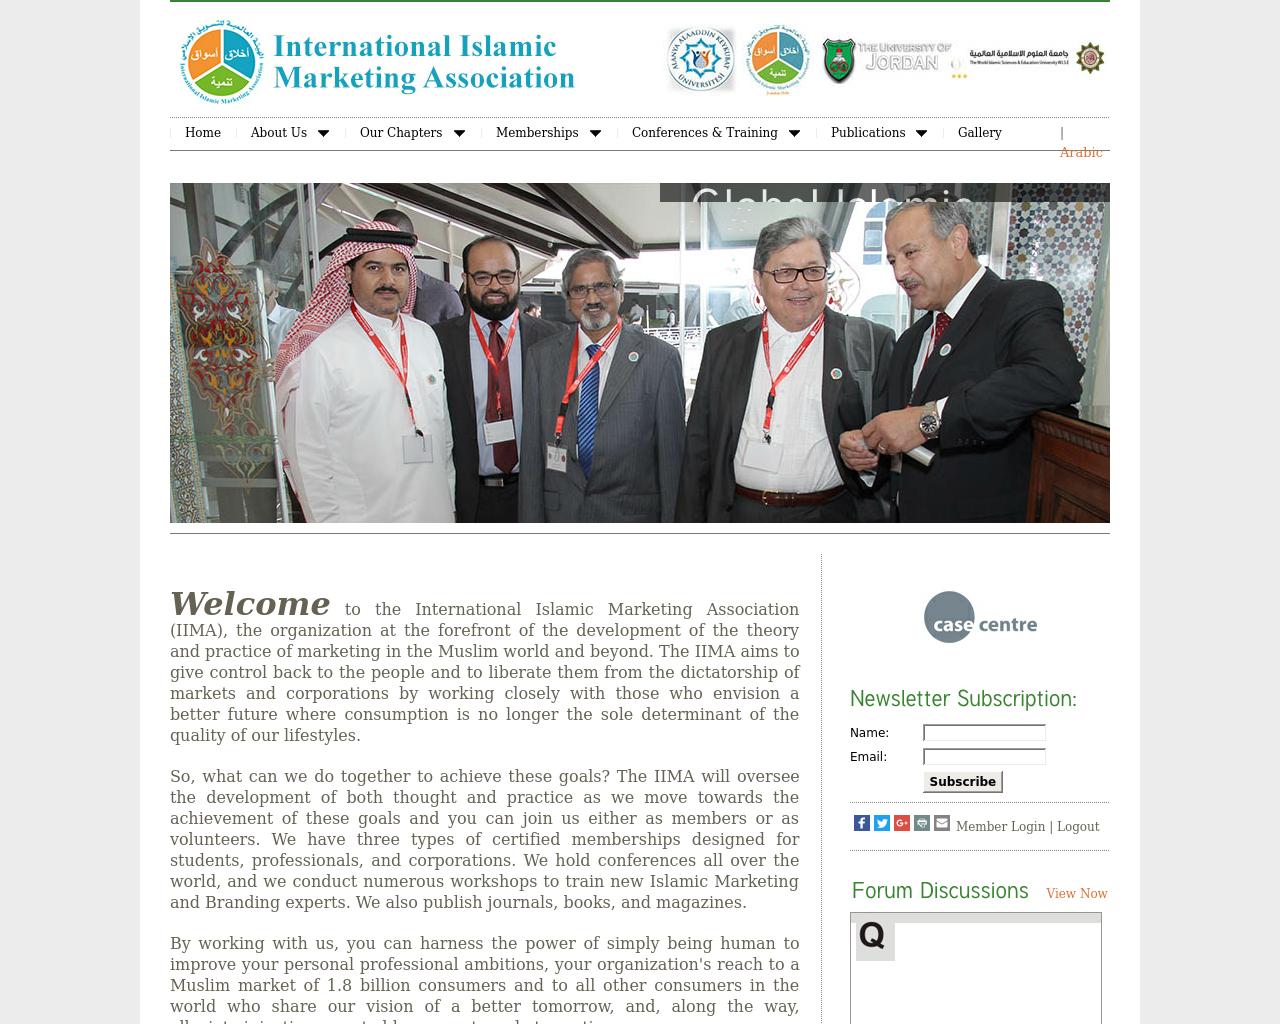 International-Islamic-Marketing-Association-Advertising-Reviews-Pricing